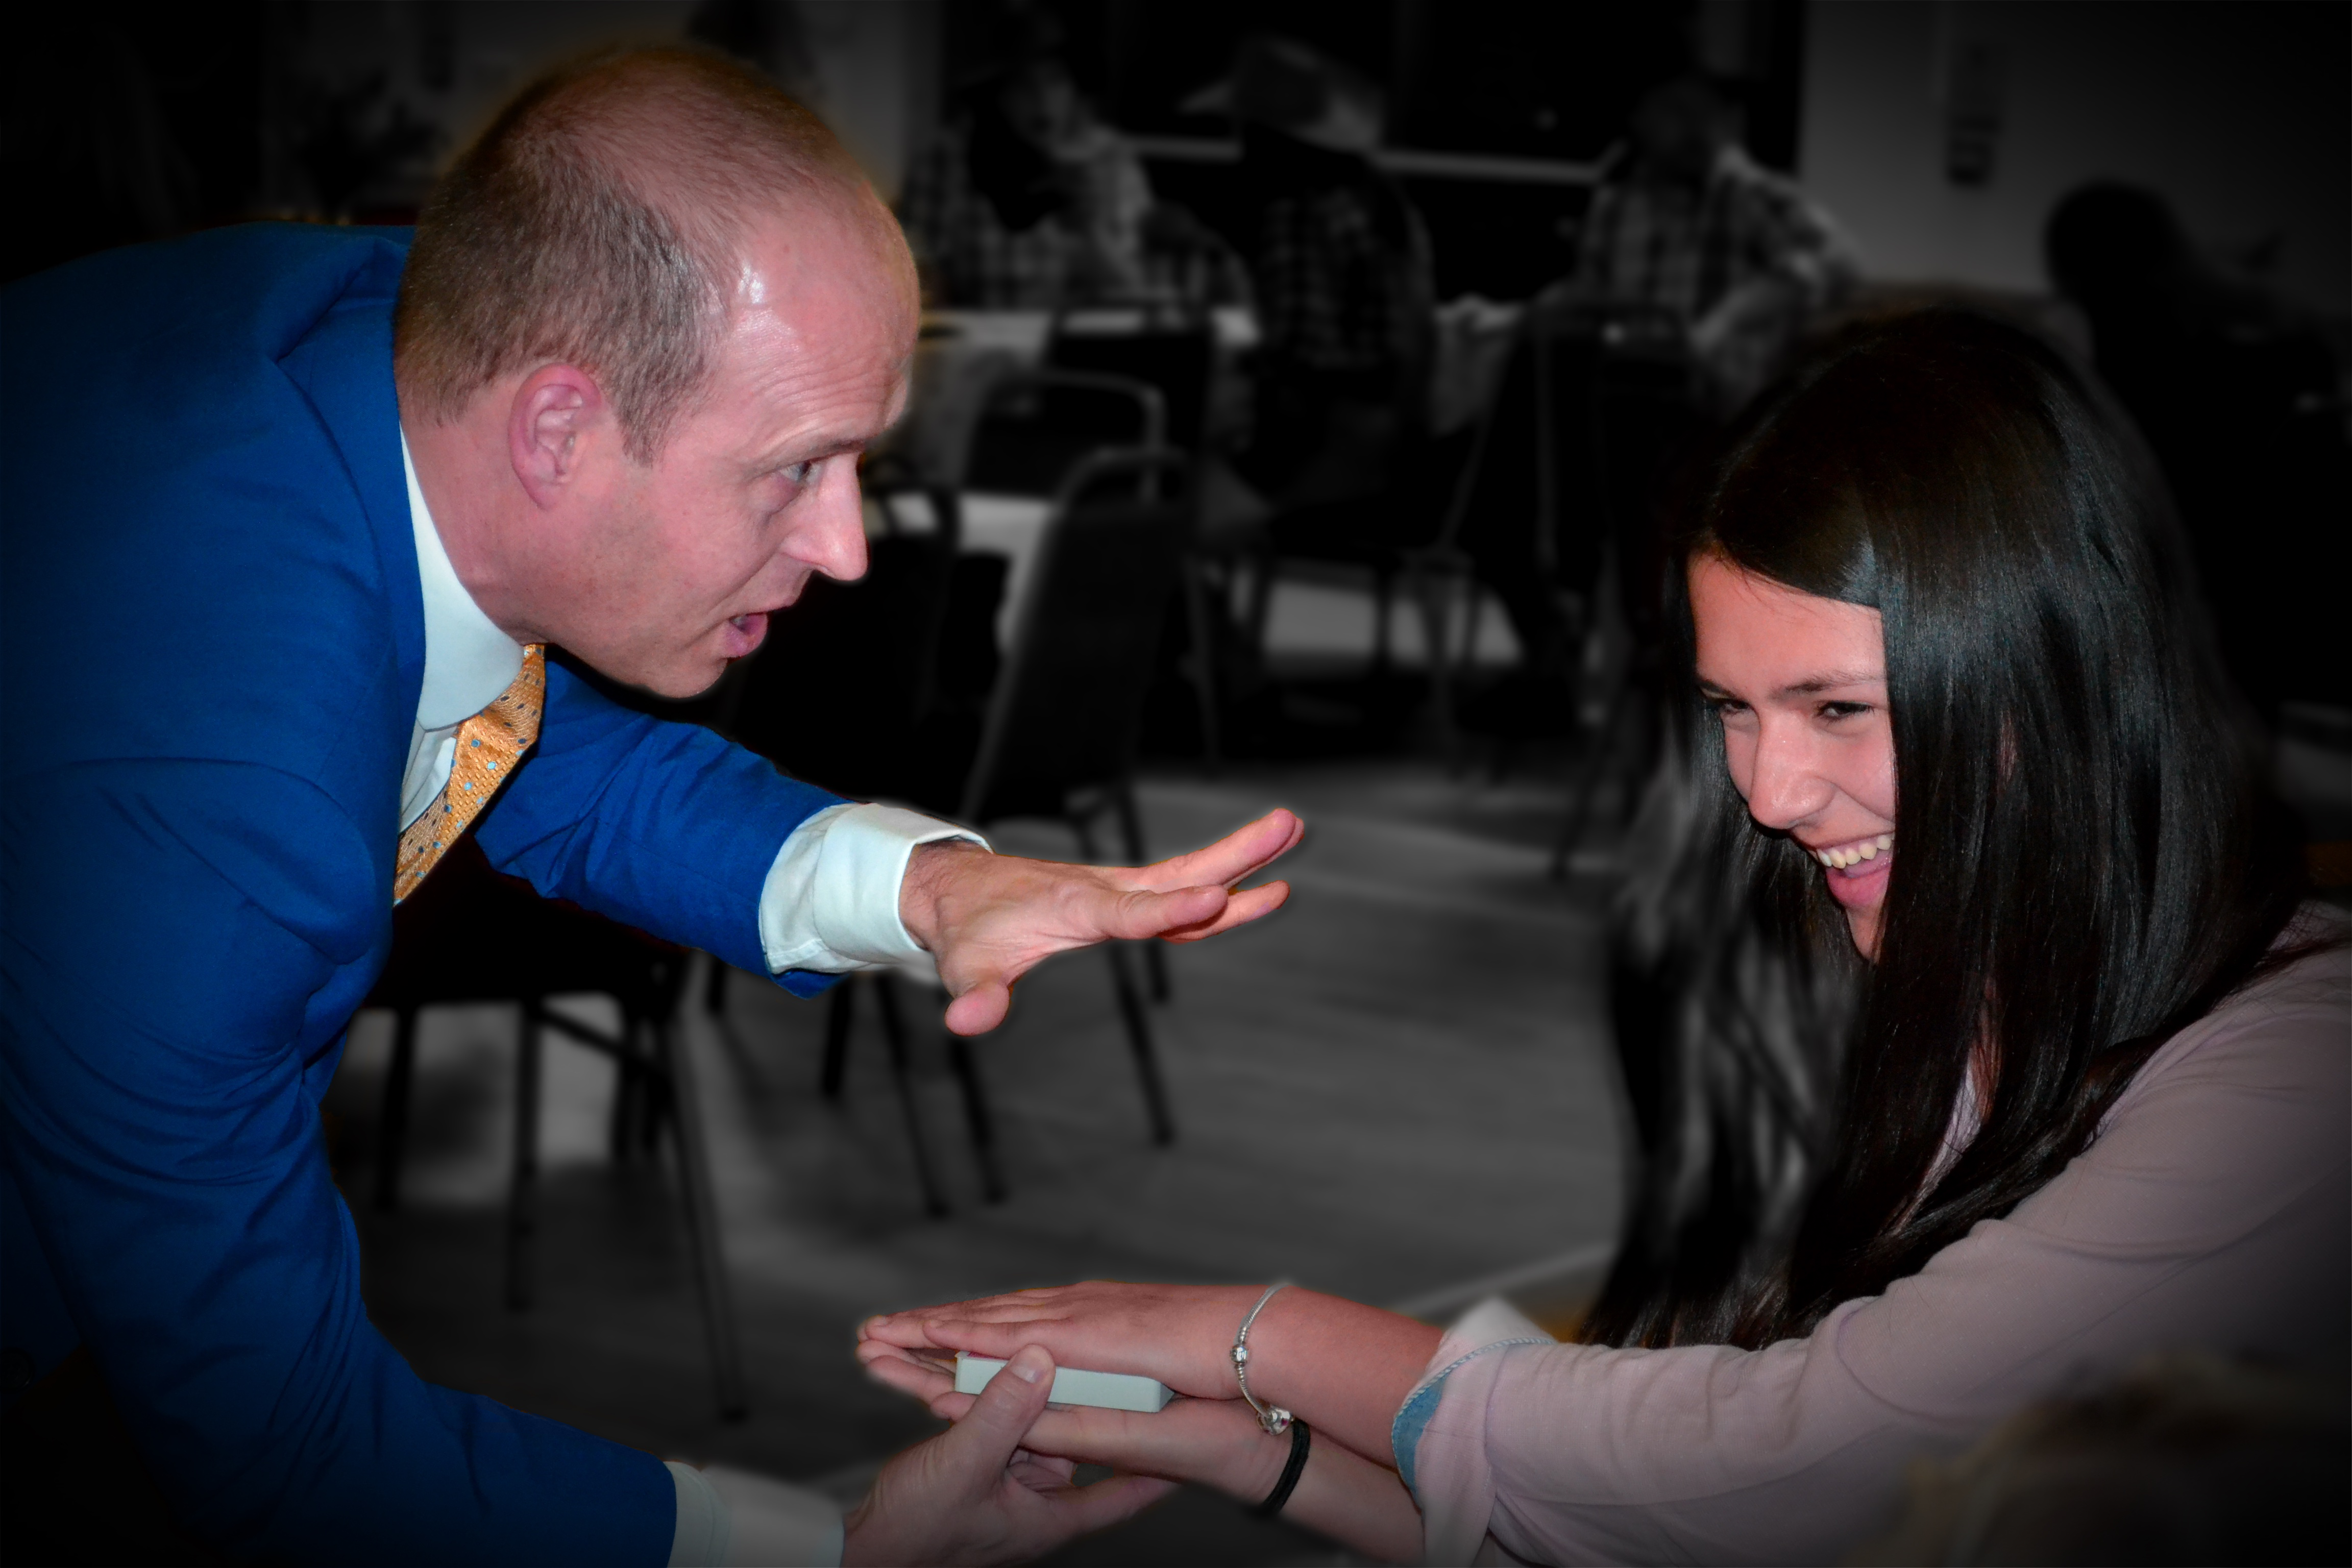 Wedding magician doing a card trick